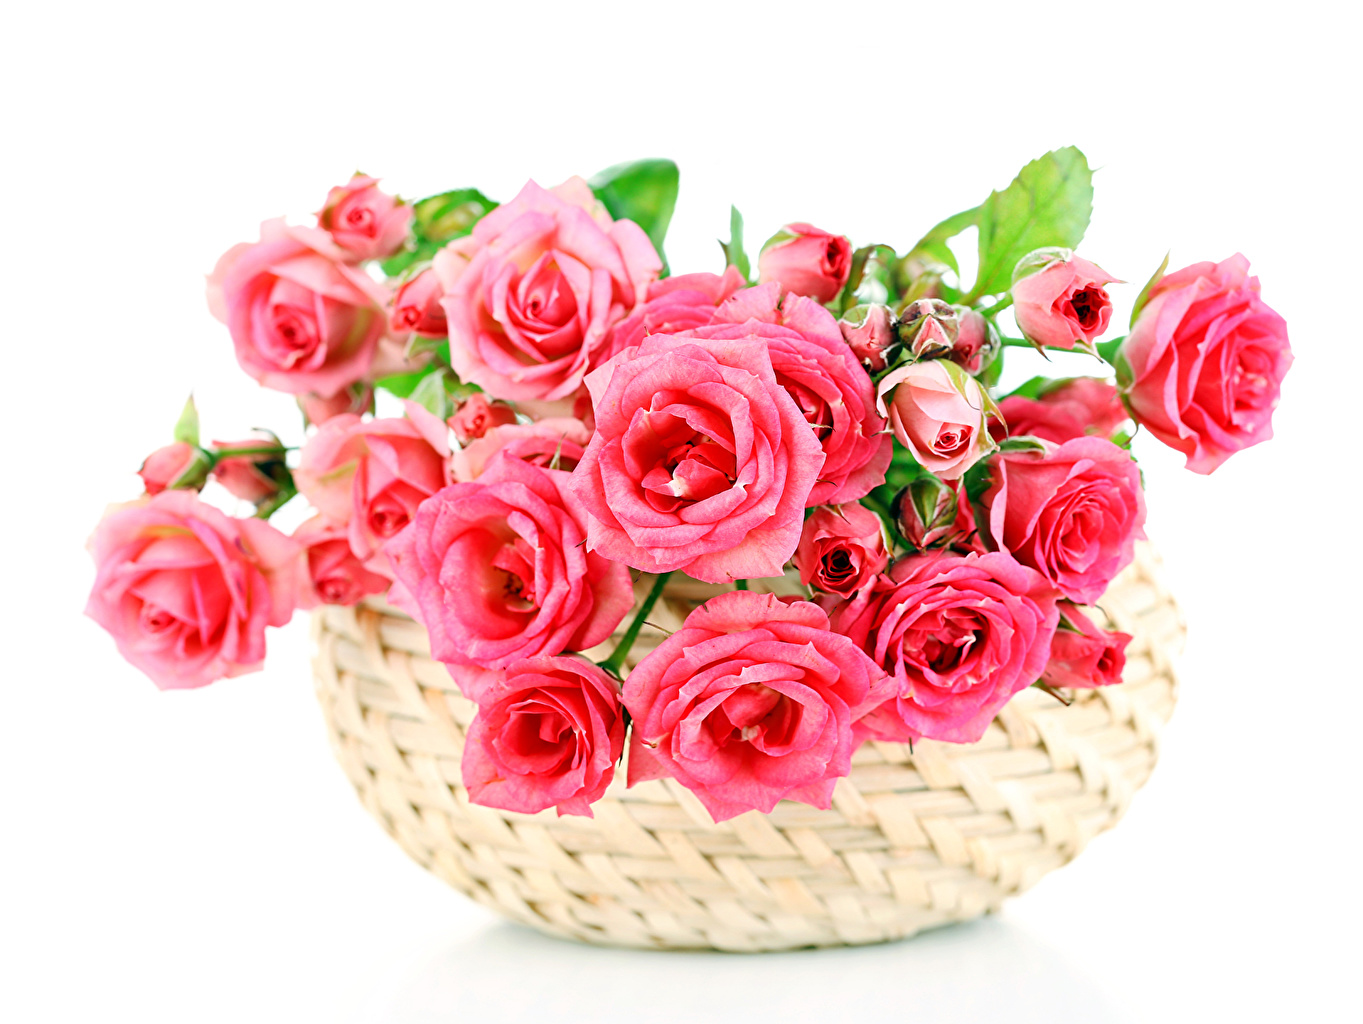 Фотография Розы розовая цветок Корзина Много Бутон роза Розовый розовые розовых Цветы корзины Корзинка